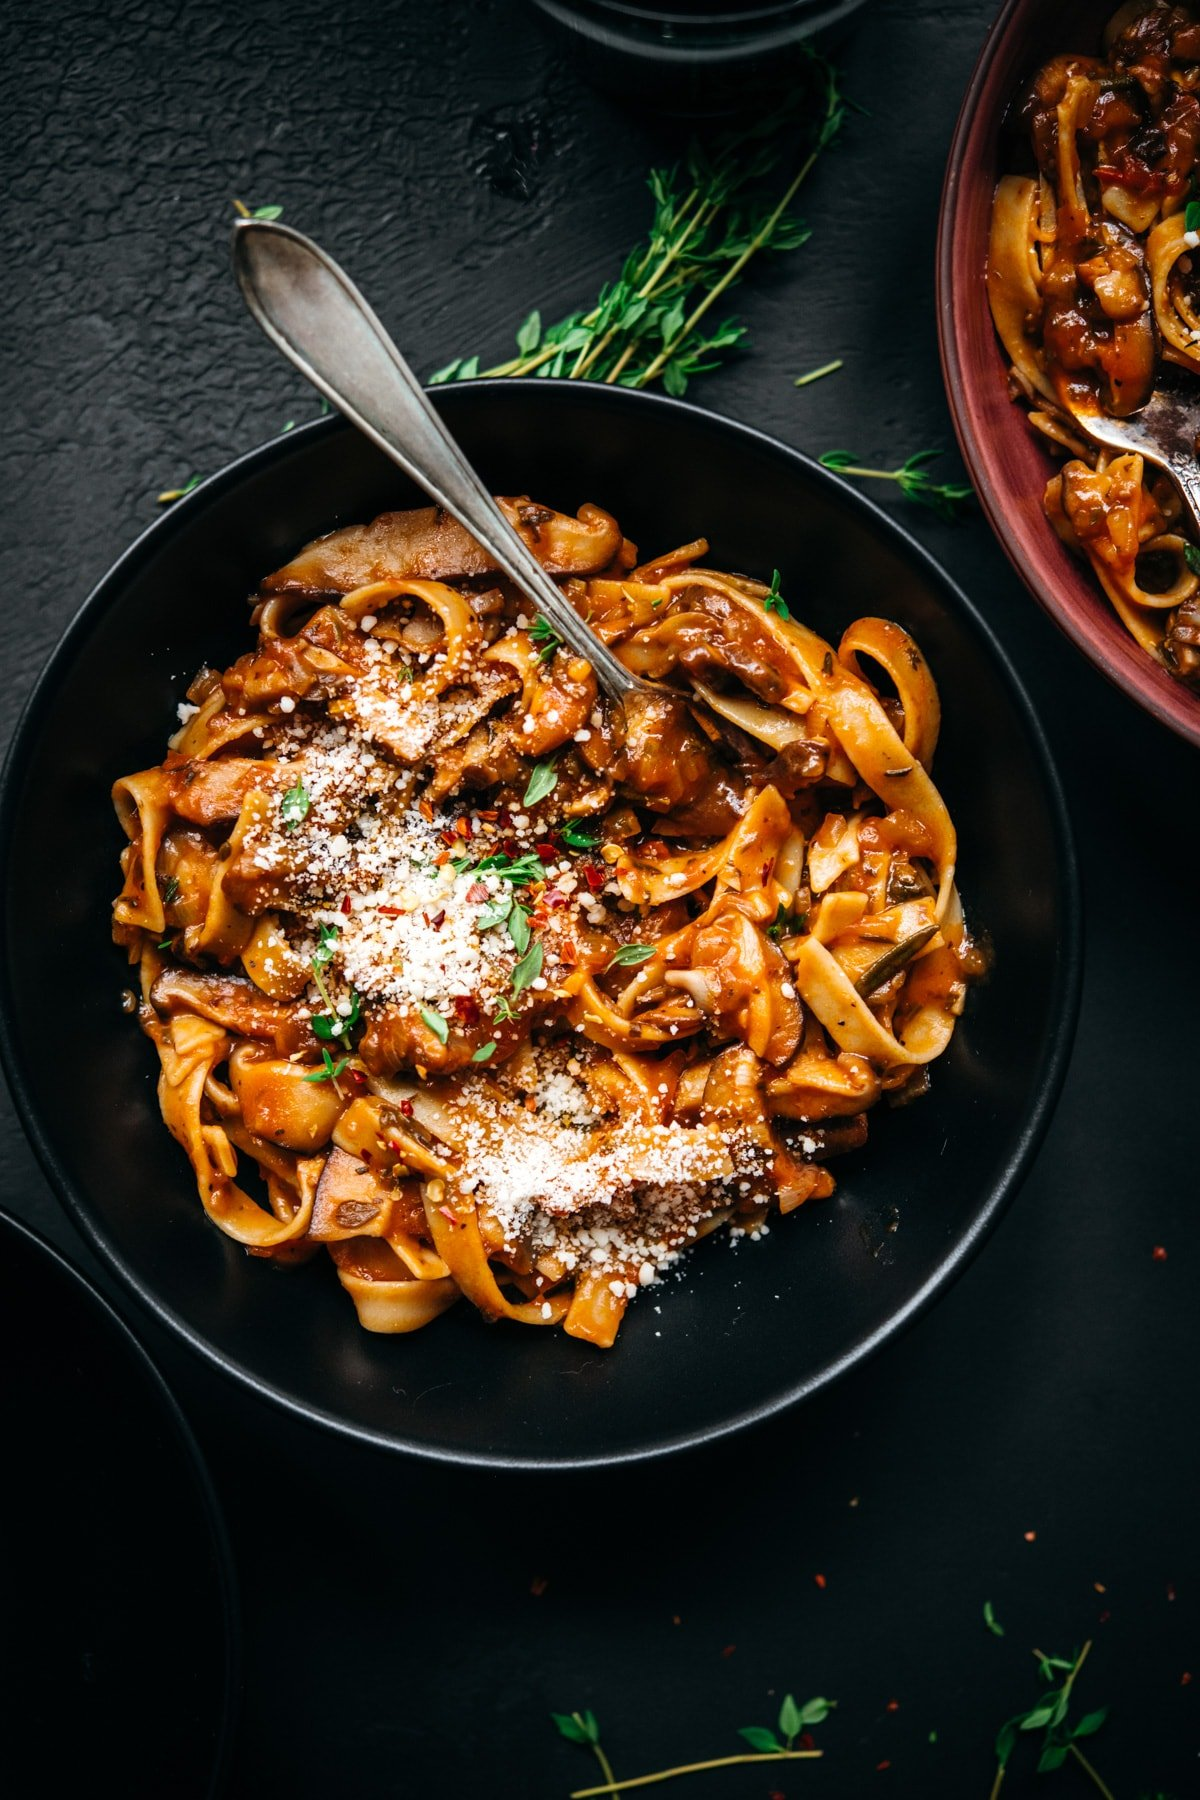 overhead view of vegan mushroom ragu over pasta in a black bowl.